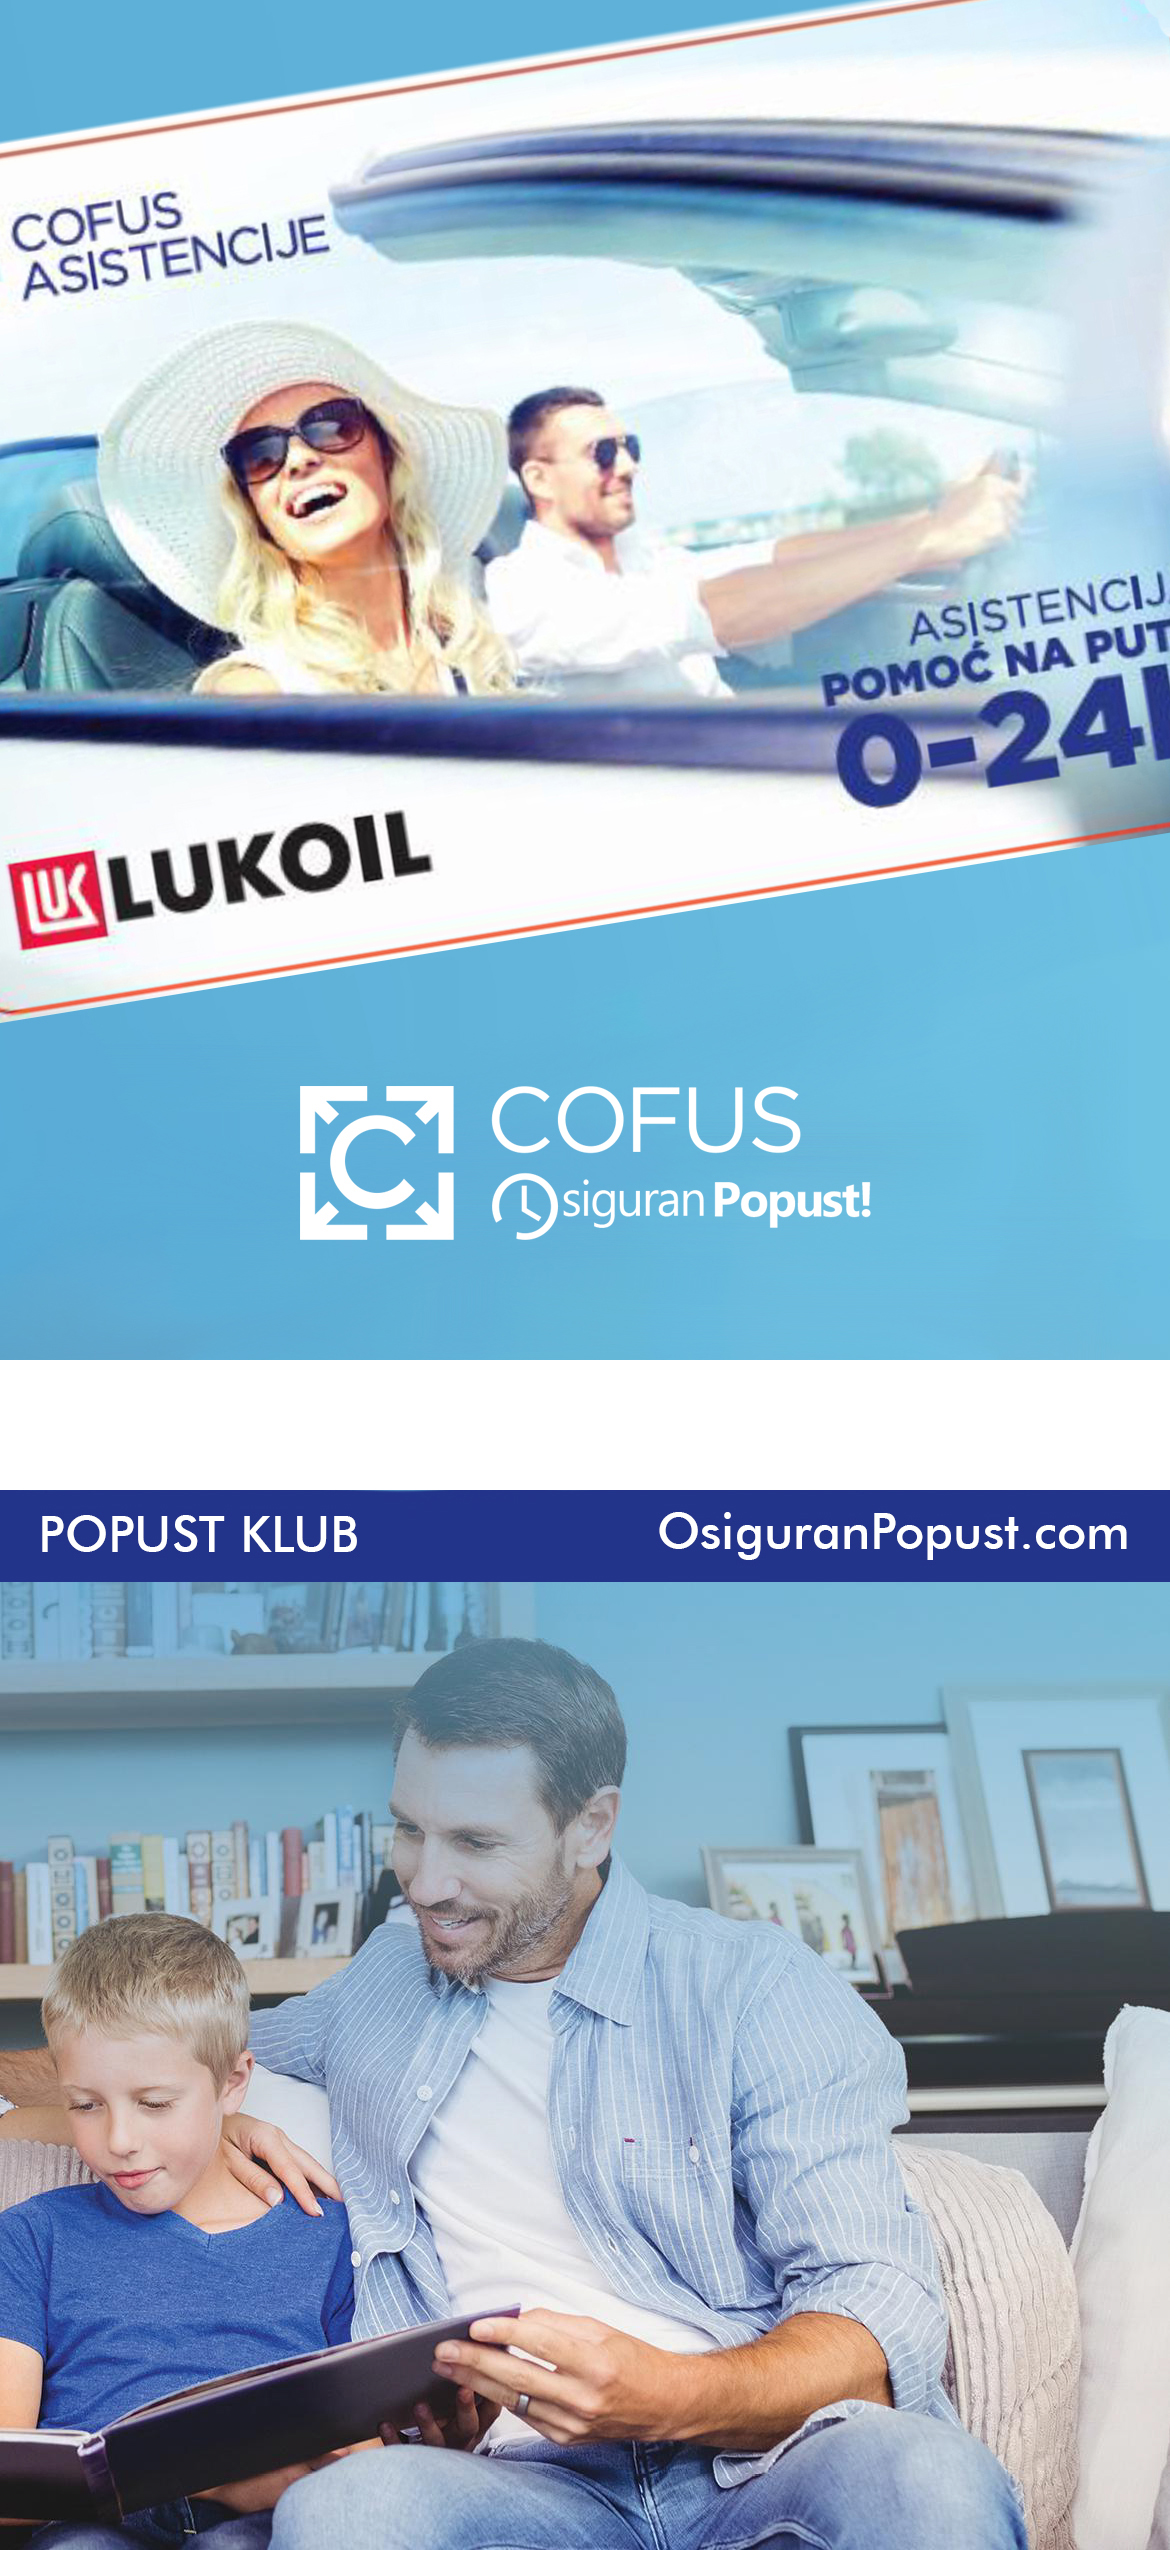 brosura-2-cofus-osiguran-popust-kartica